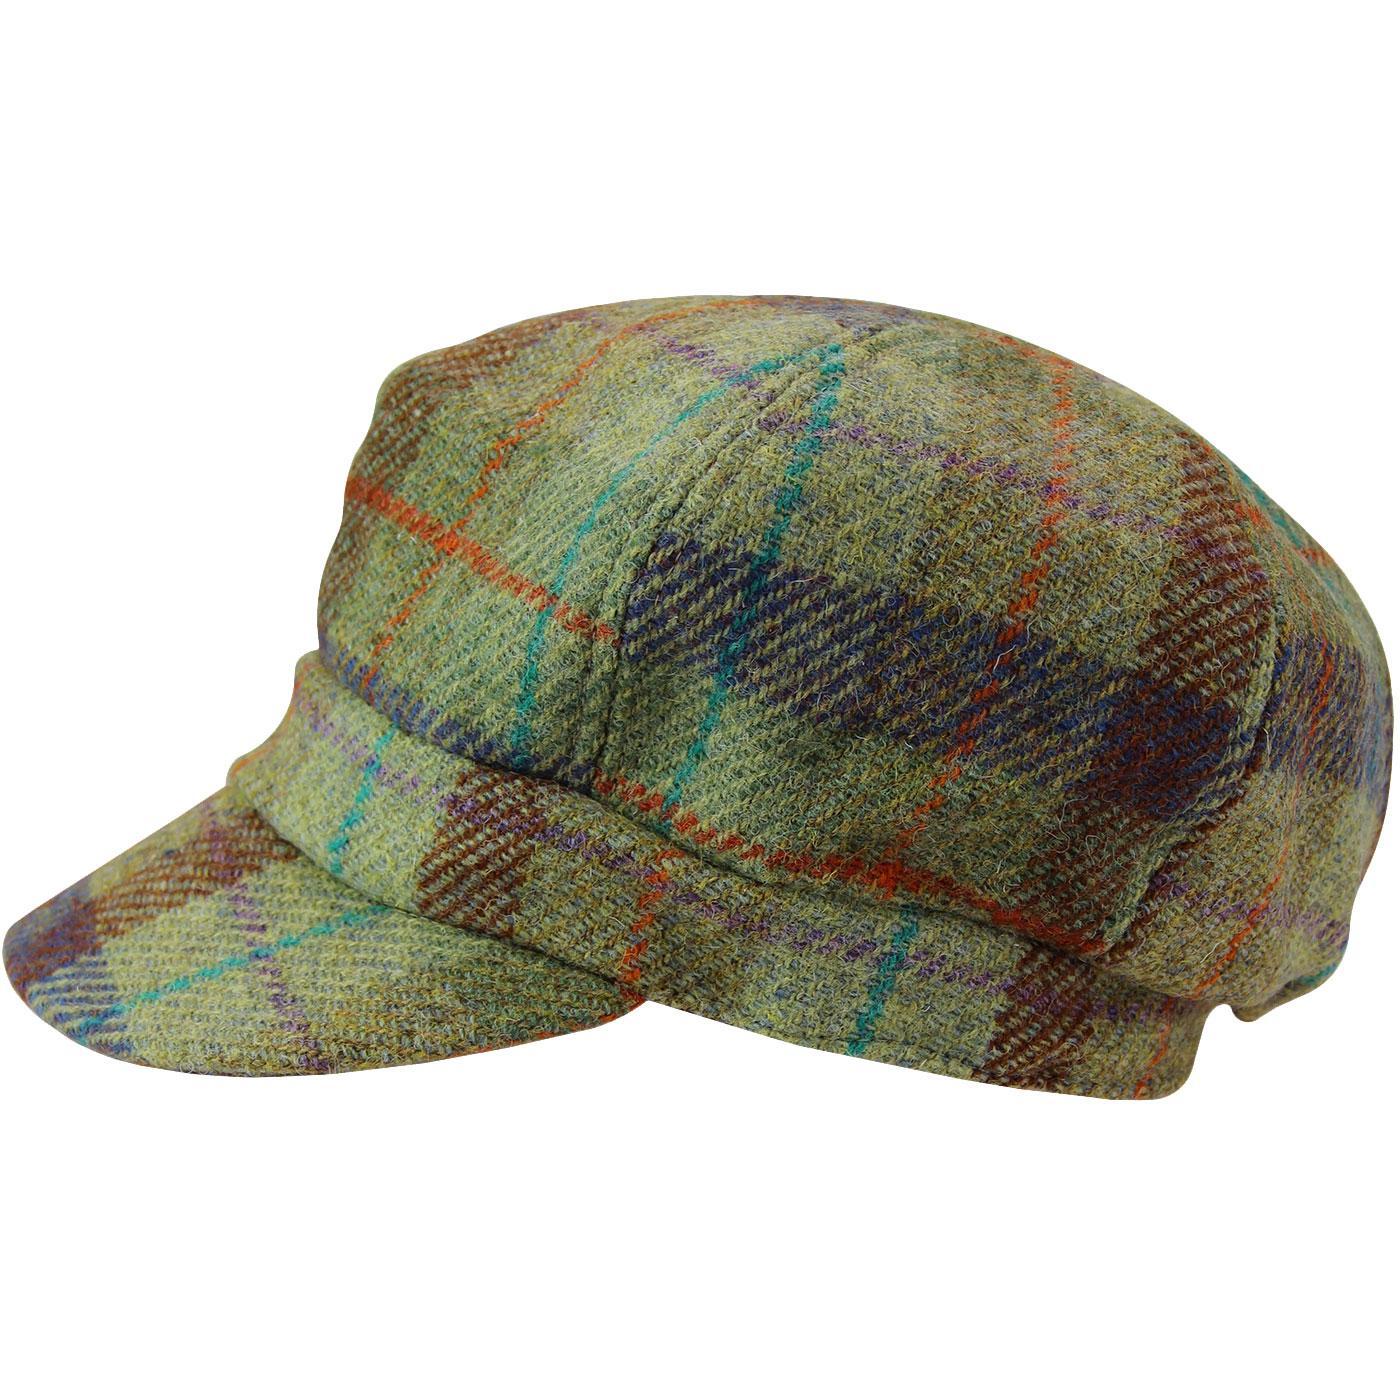 FAILSWORTH Women's Mod Harris Tweed Bakerboy Cap G